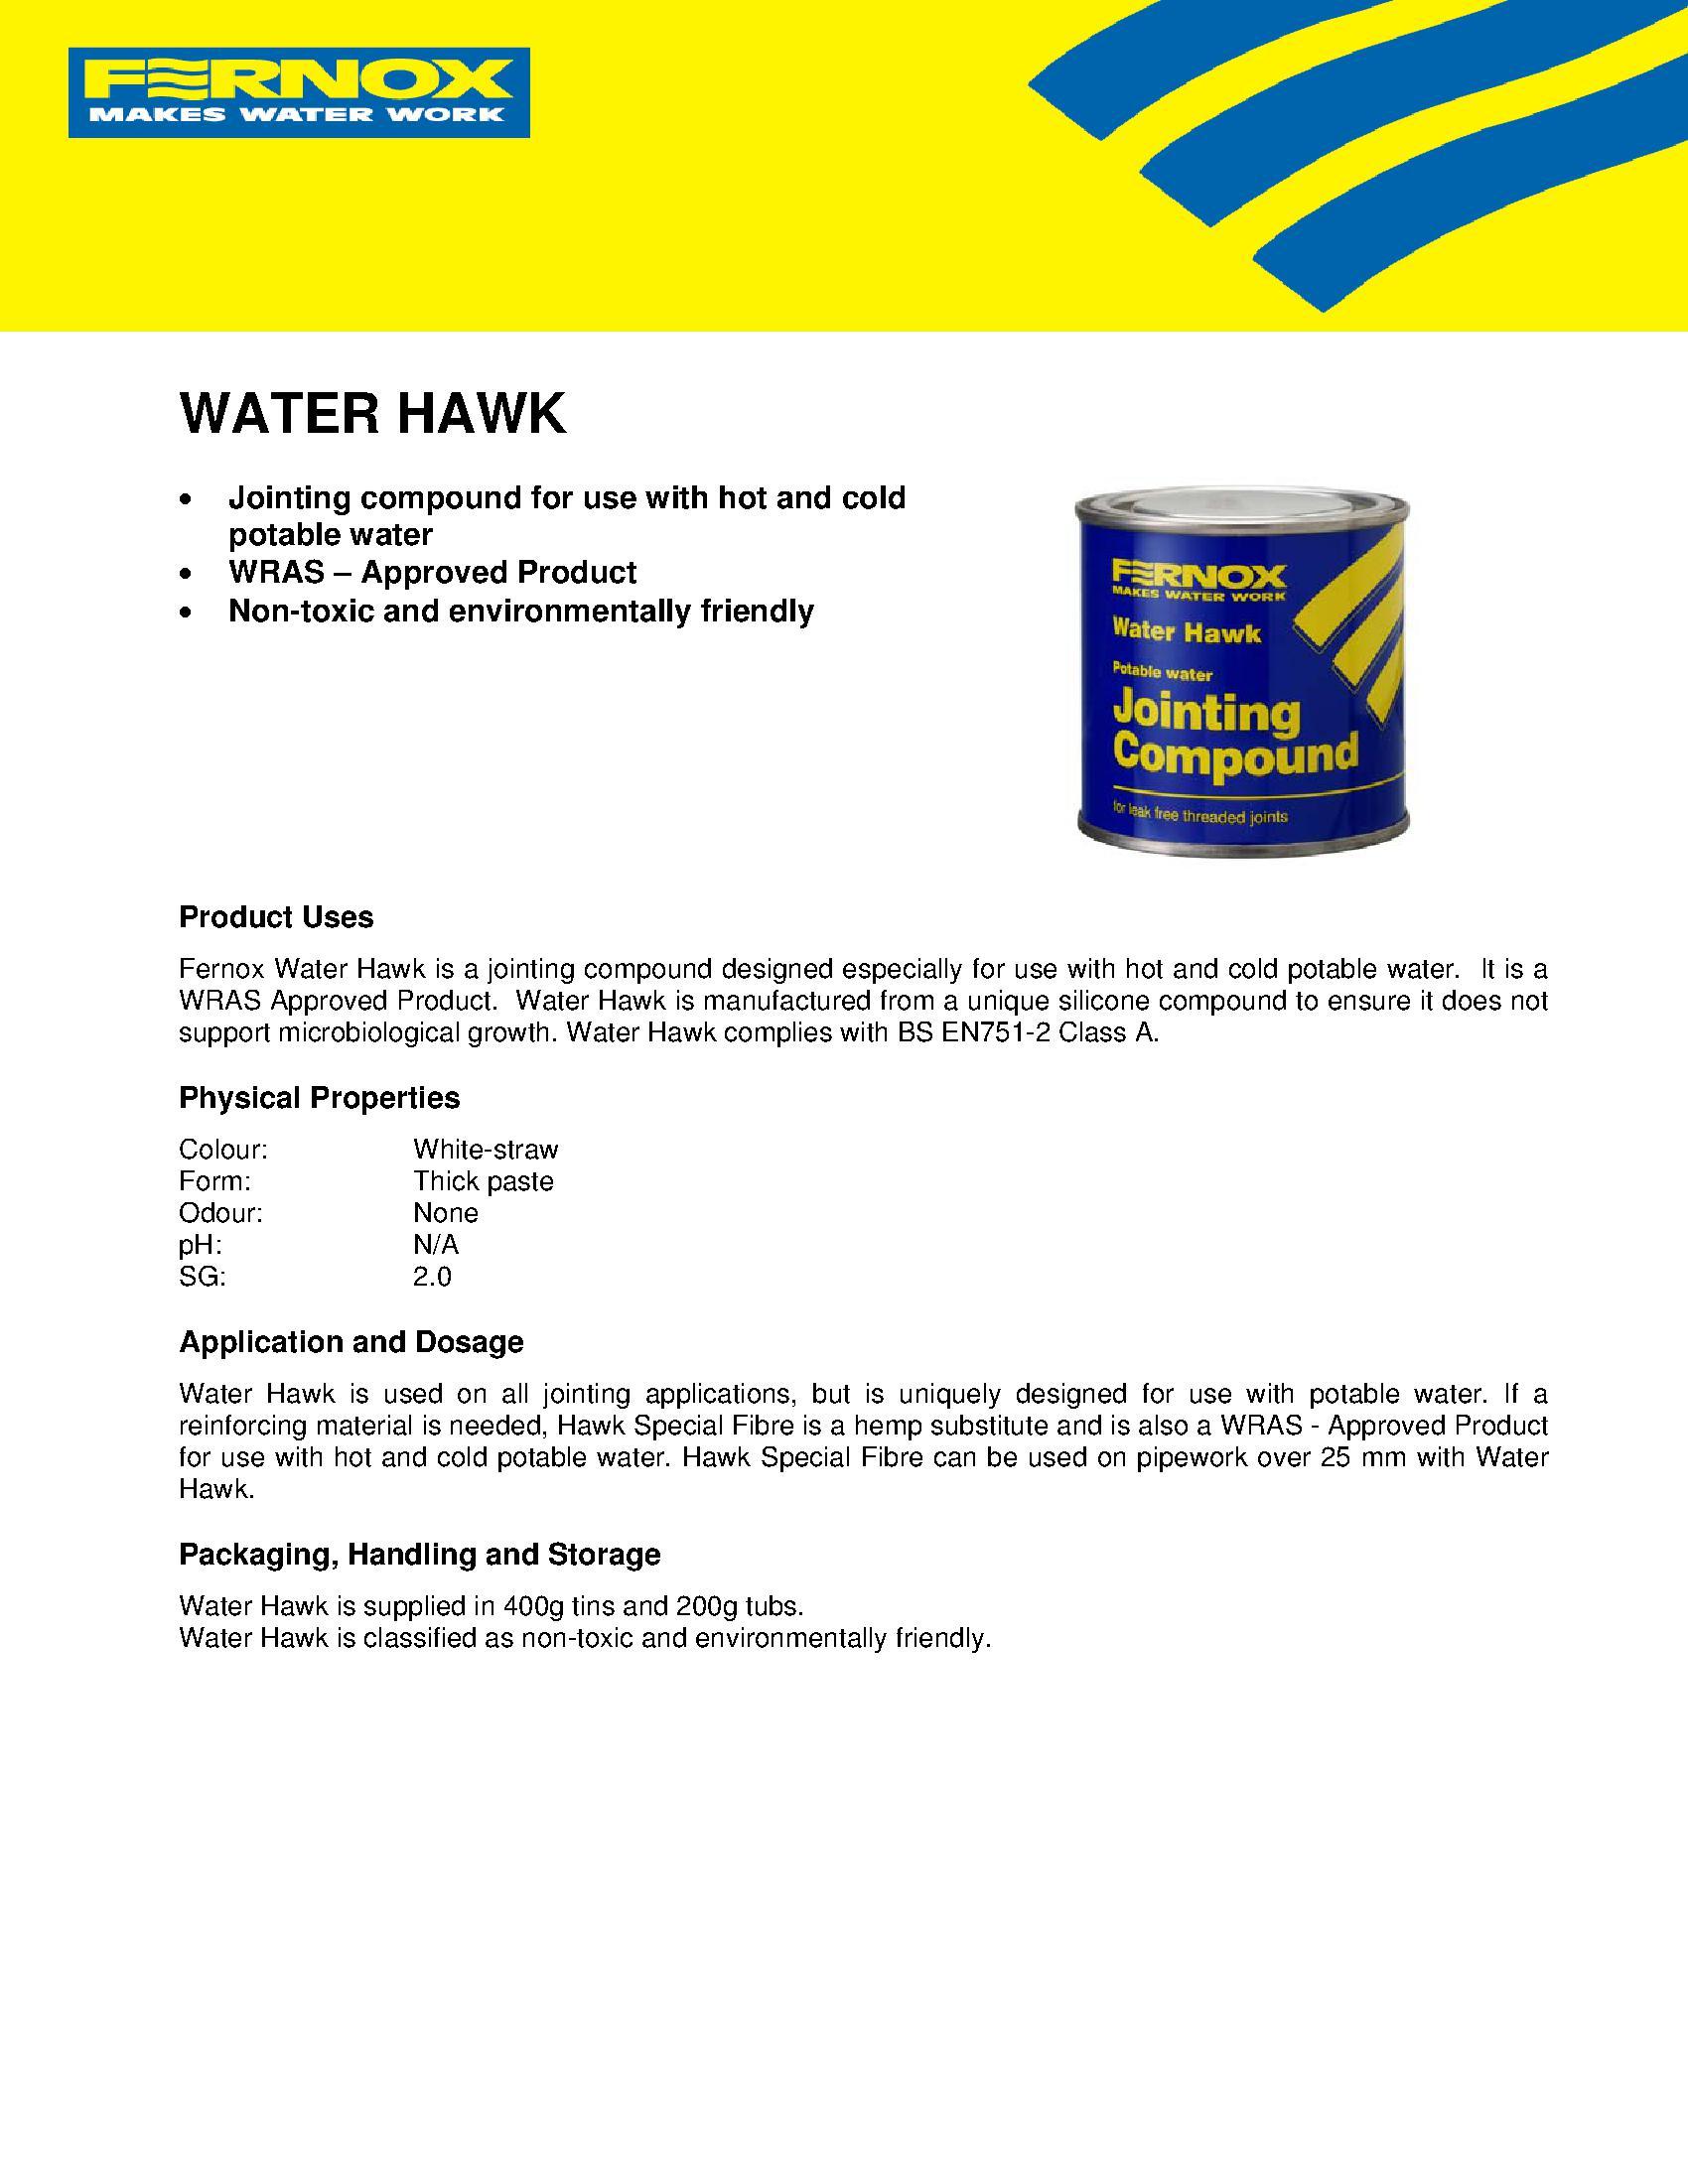 Fernox Water Hawk PDF